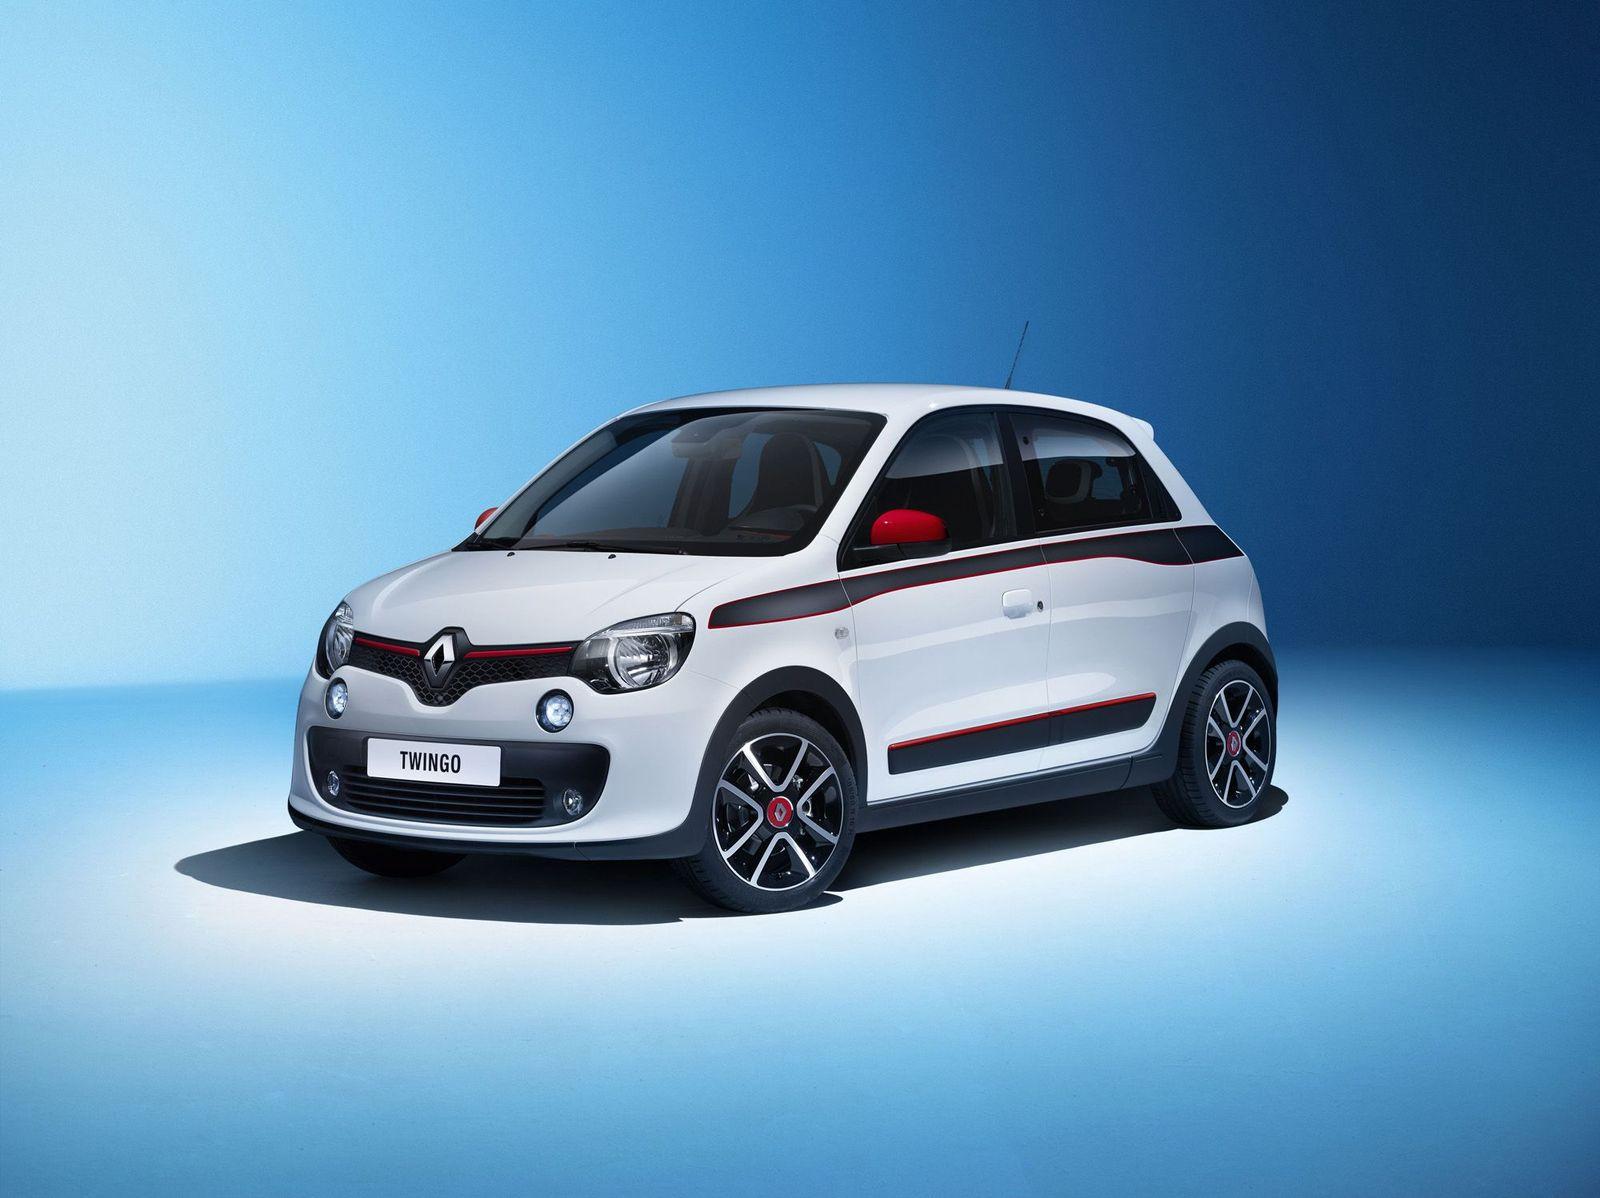 2014 / Genf / Renault Twingo